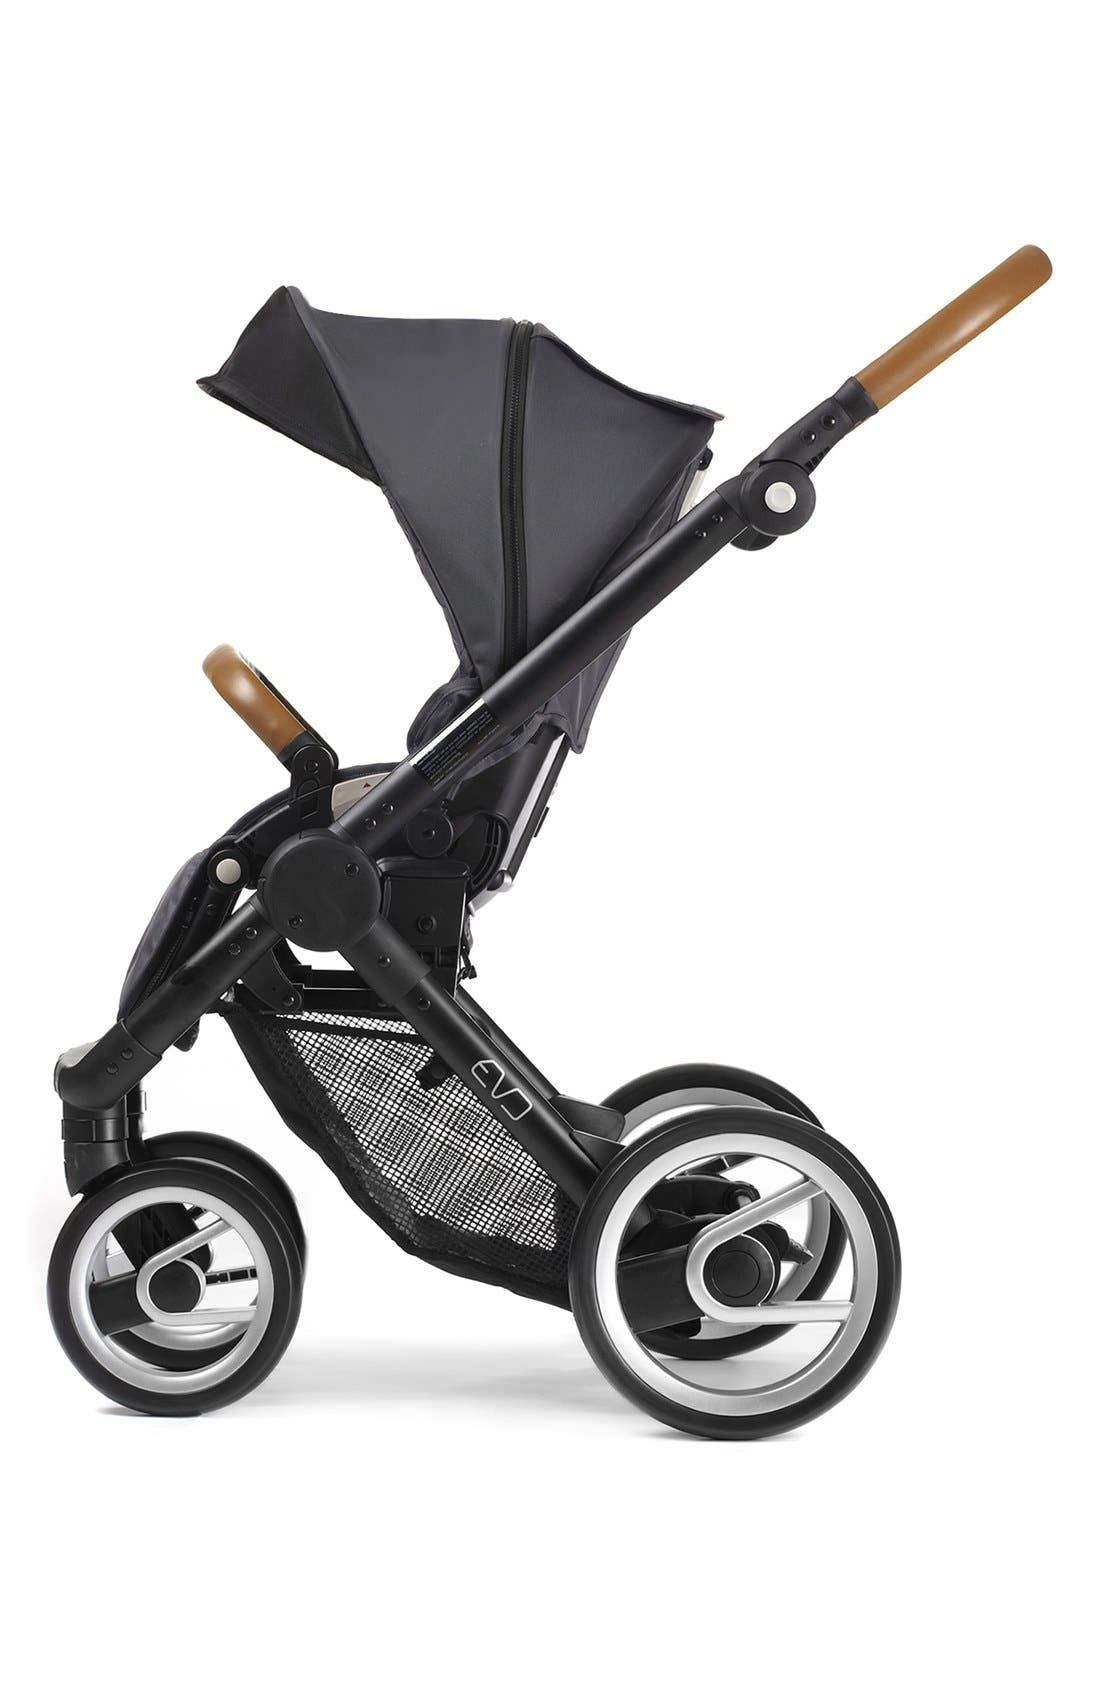 Alternate Image 1 Selected - Mutsy 'Evo - Urban Nomad' Stroller